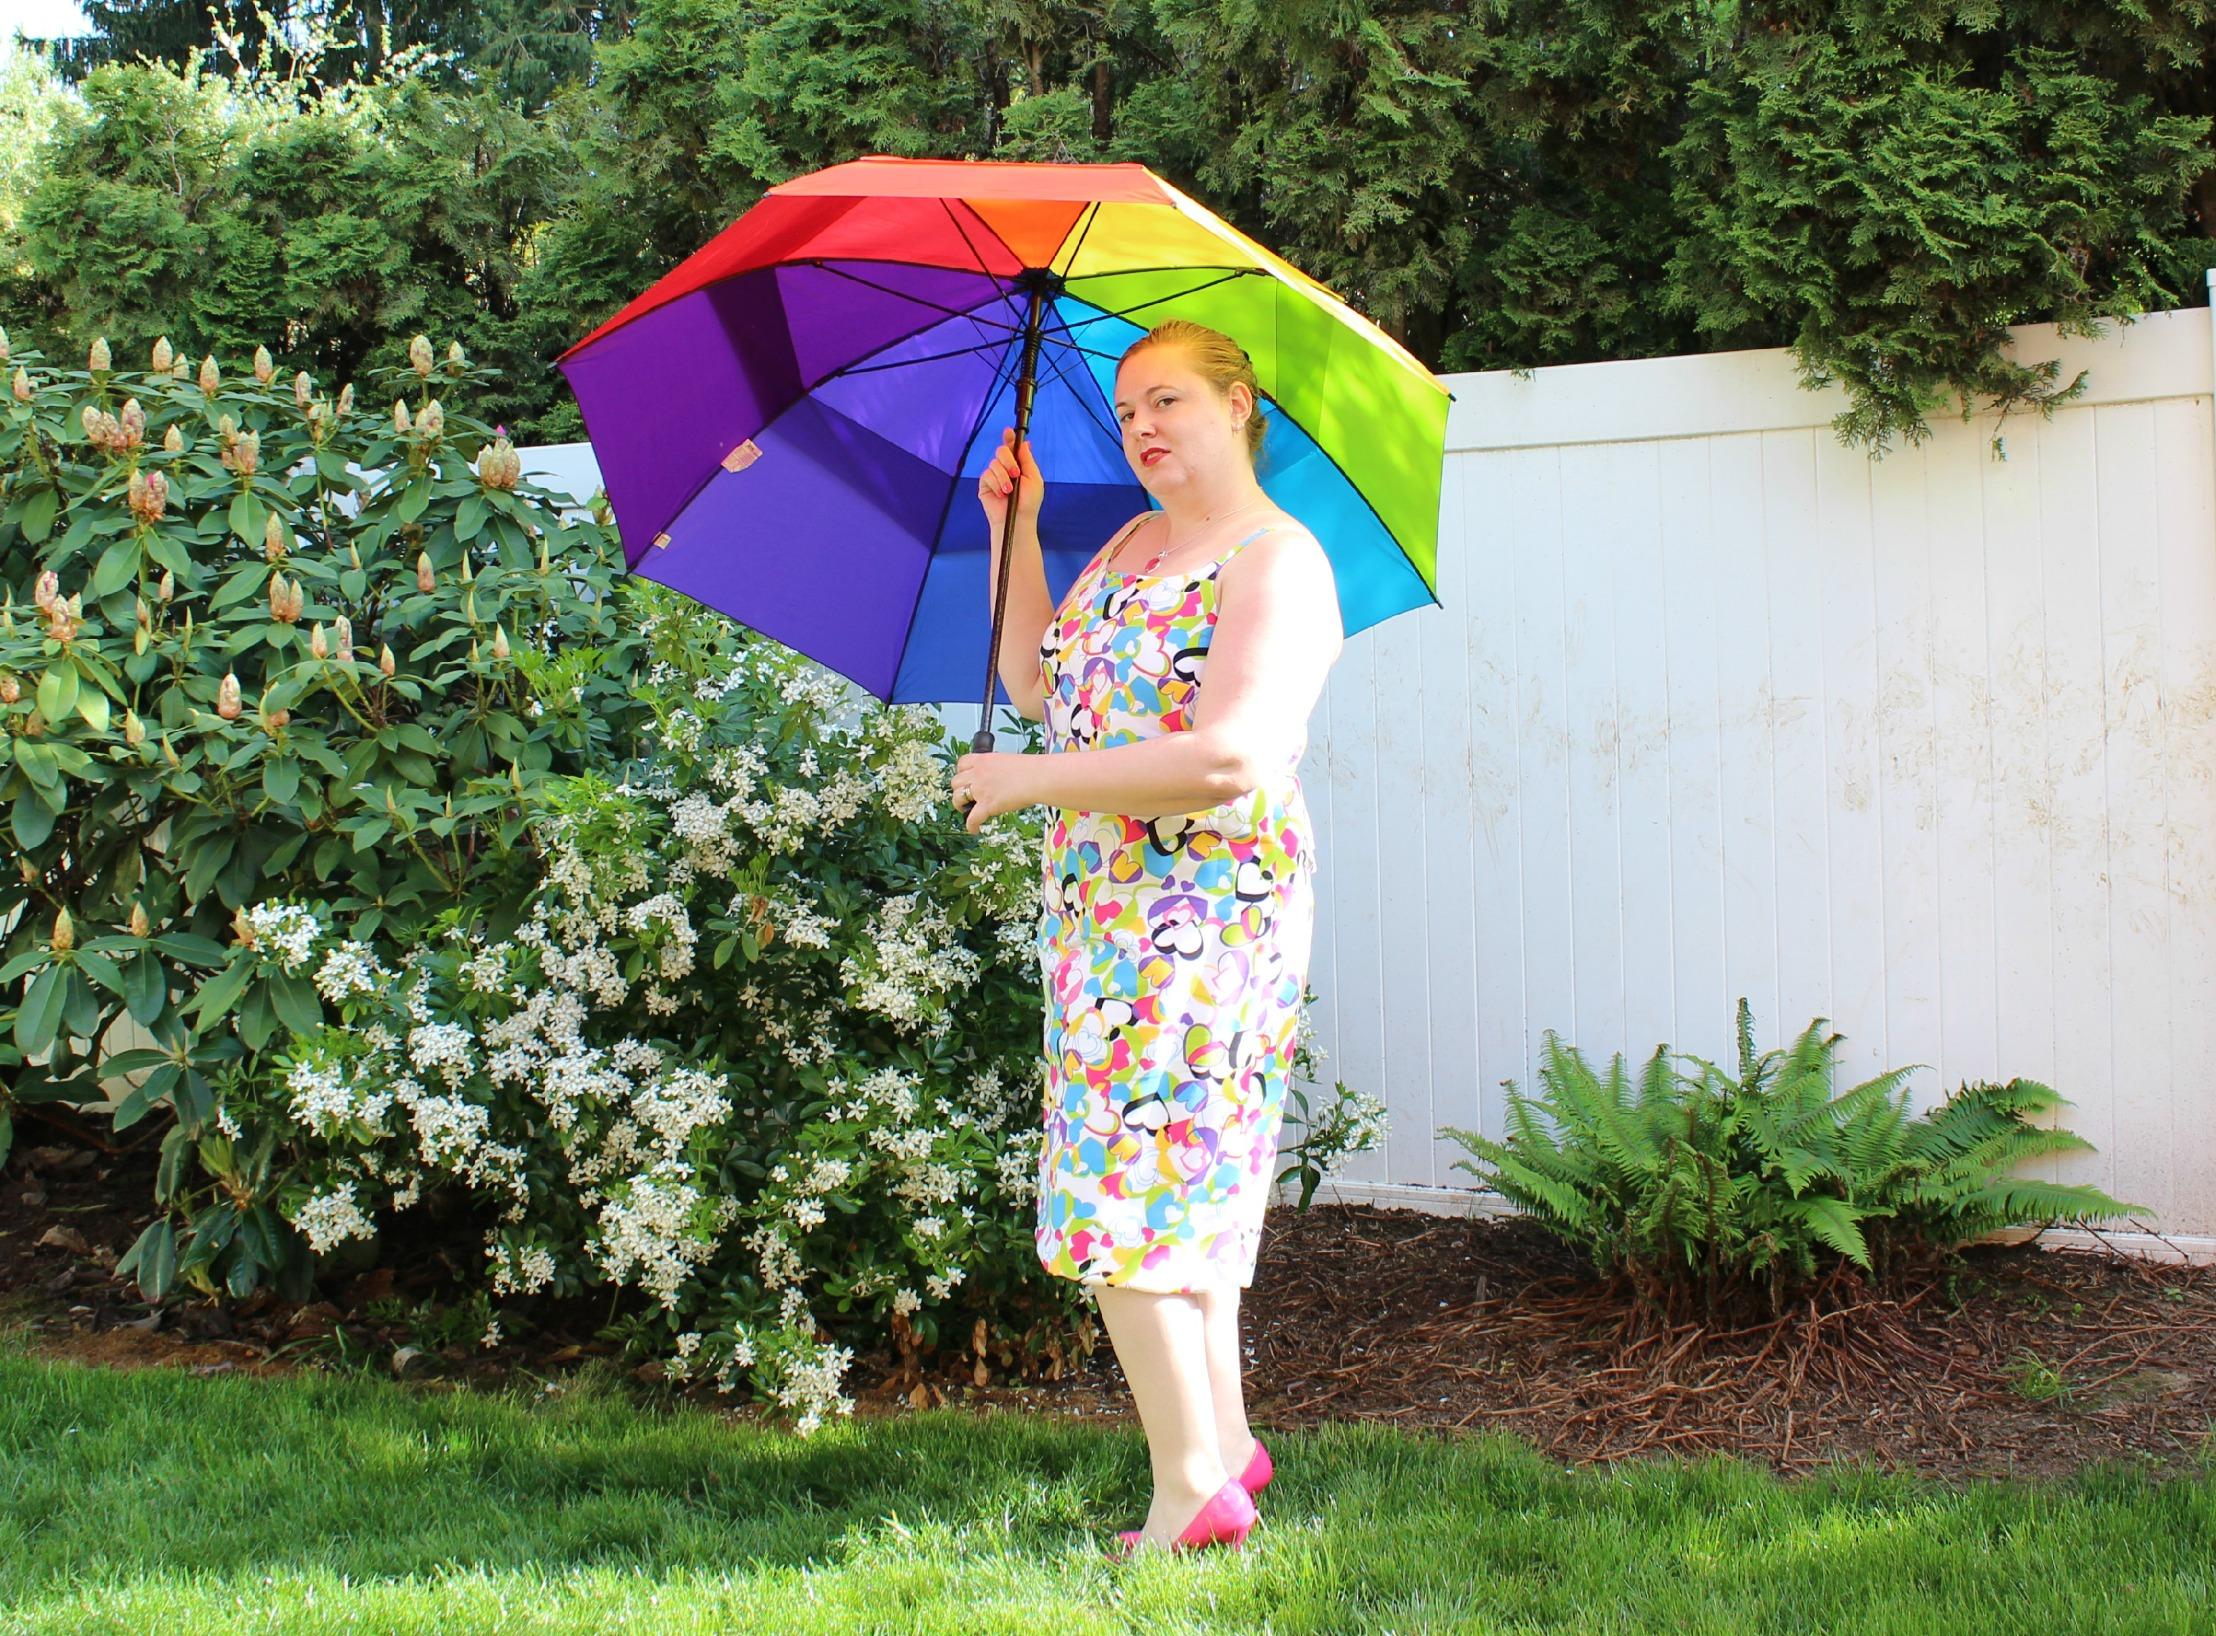 Heart Dress with Umbrella 2